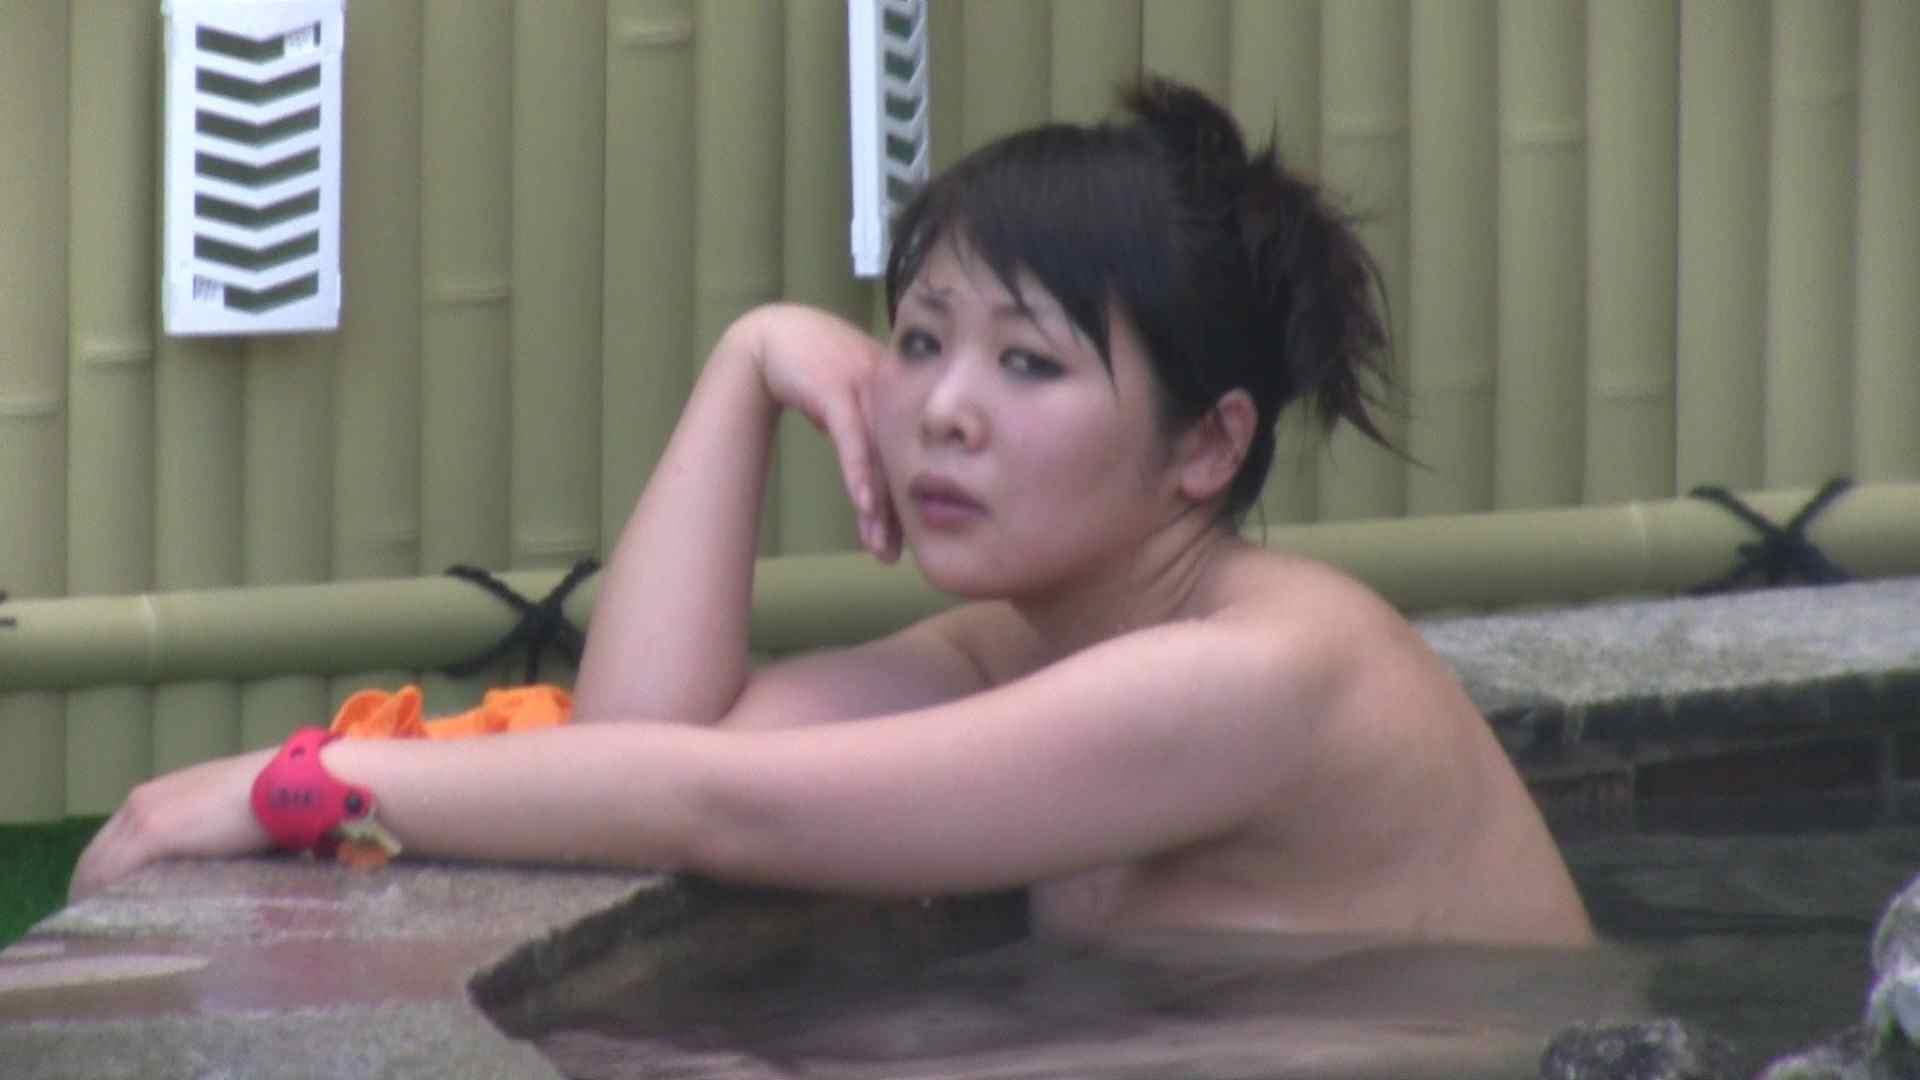 Aquaな露天風呂Vol.118 OL女体 | 露天  68連発 64